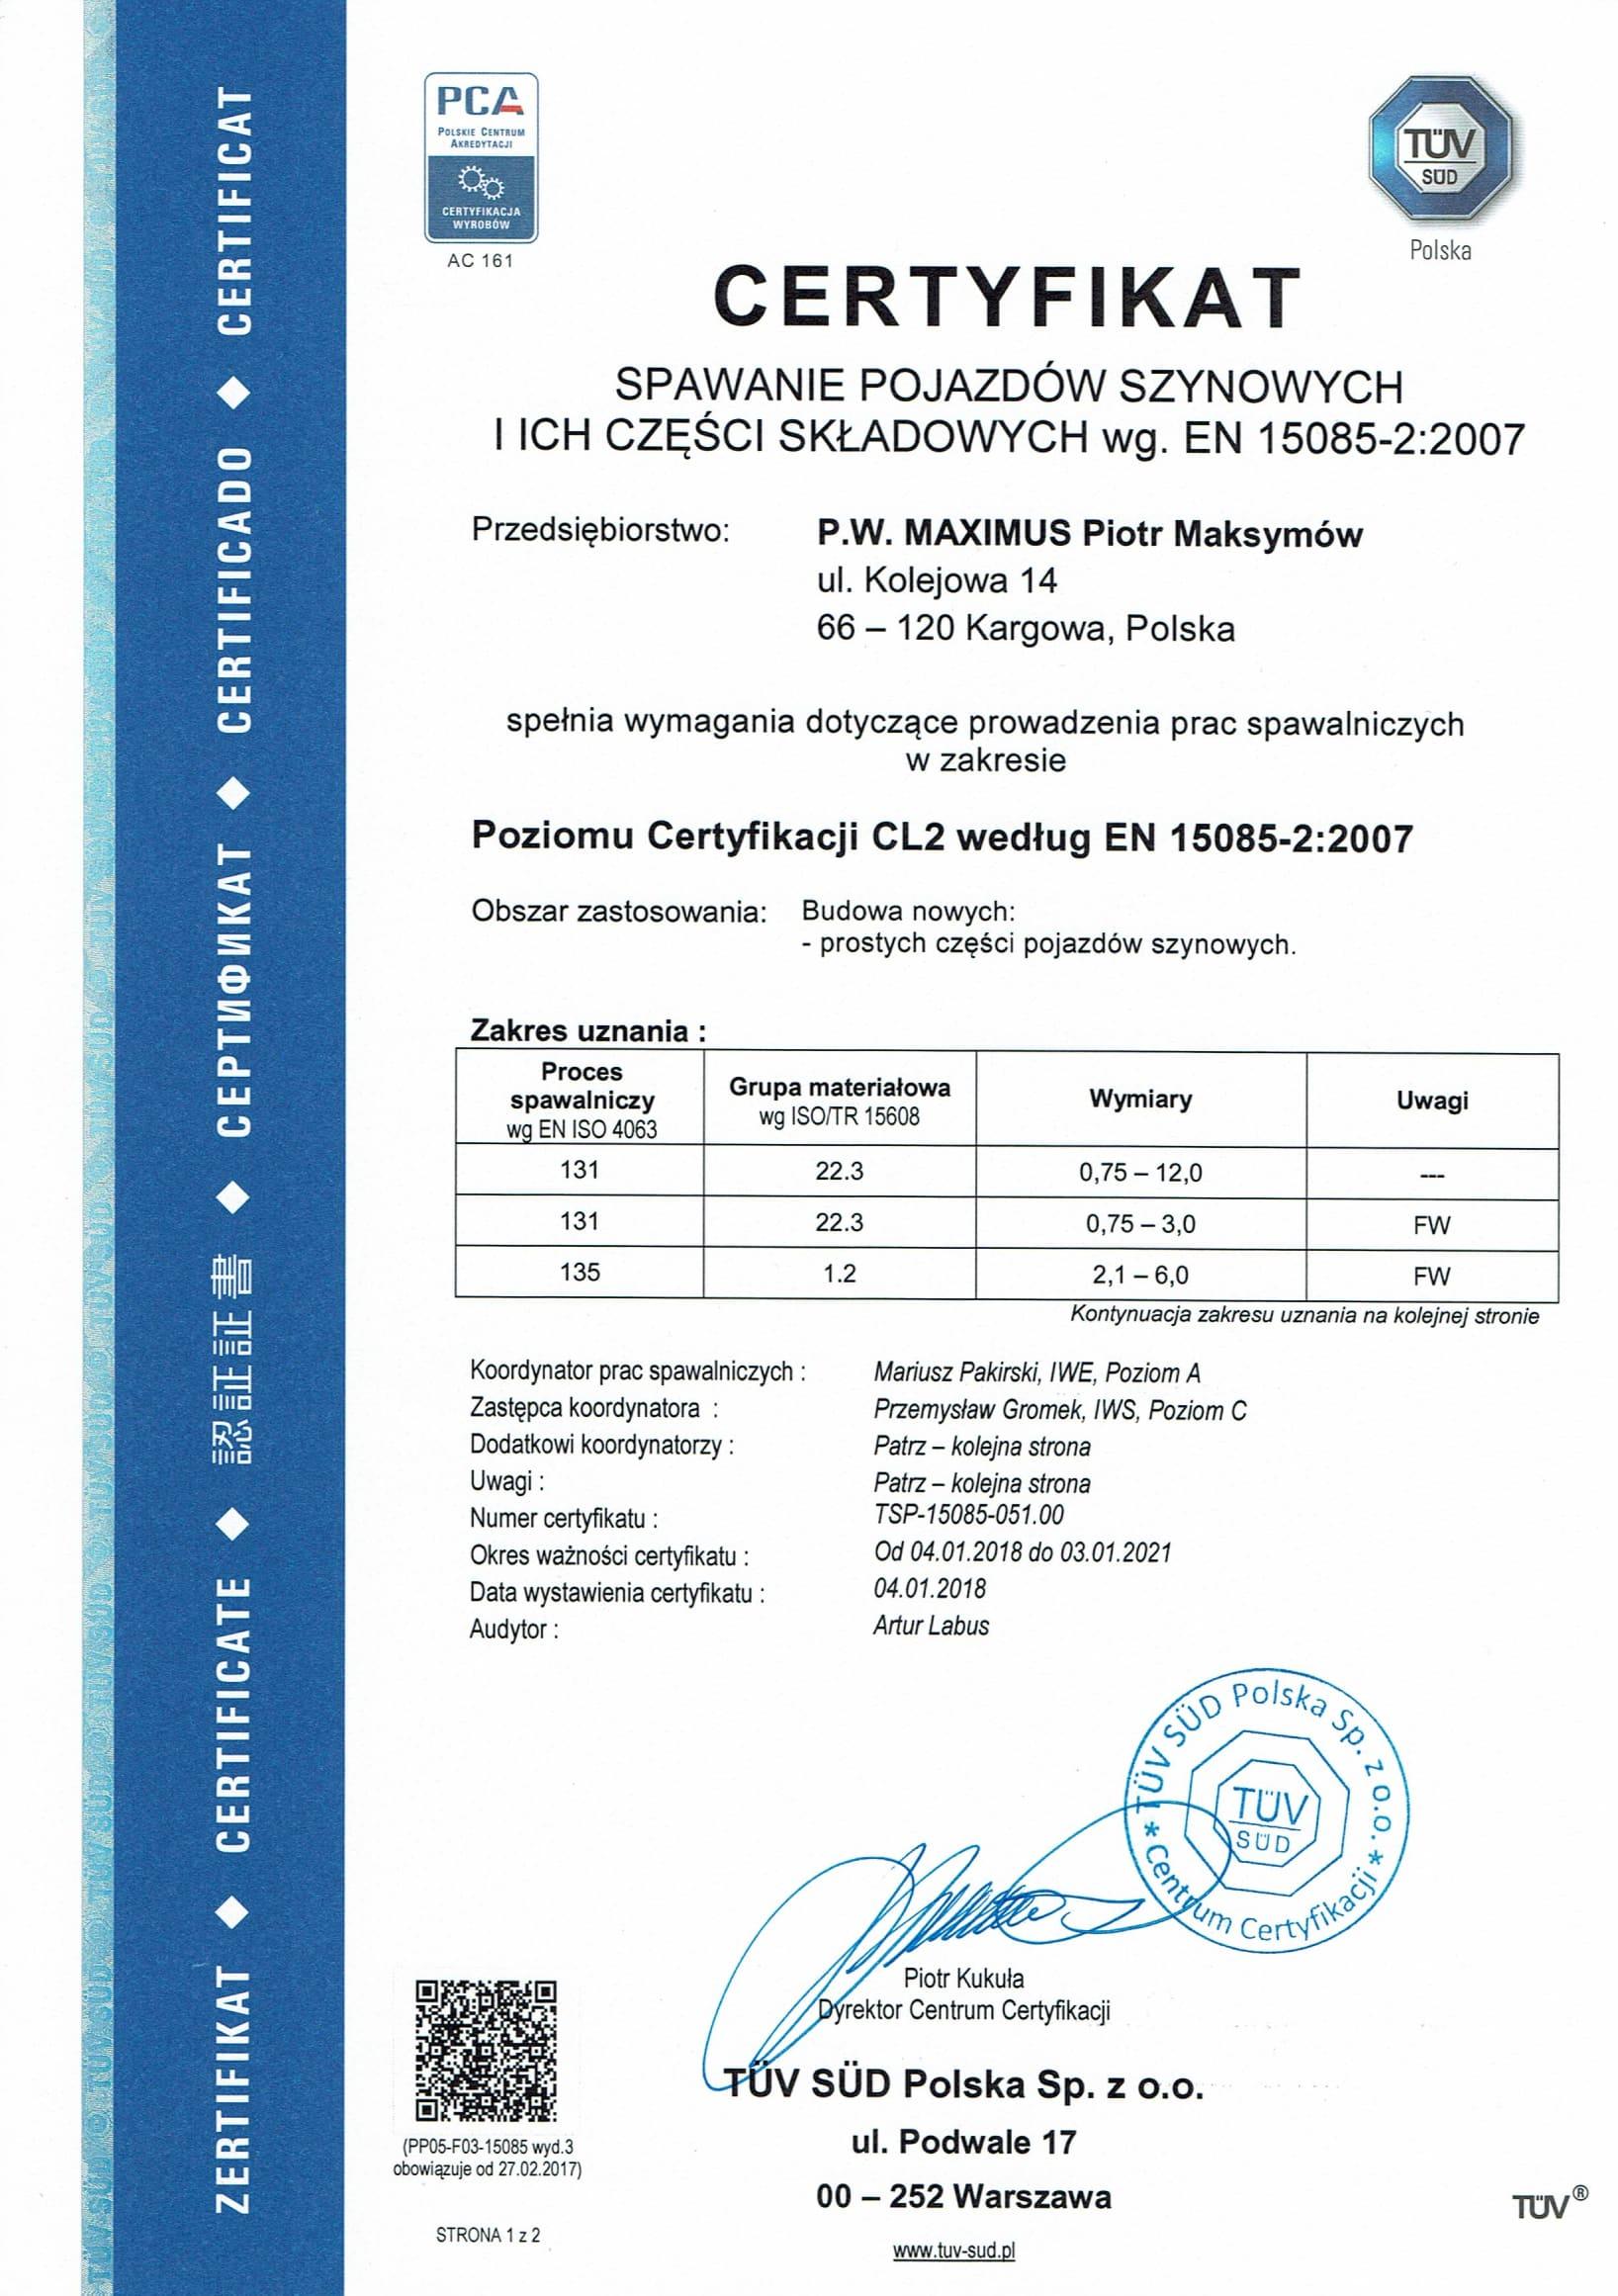 CERTYFIKAT POLSKI 15085 1 2